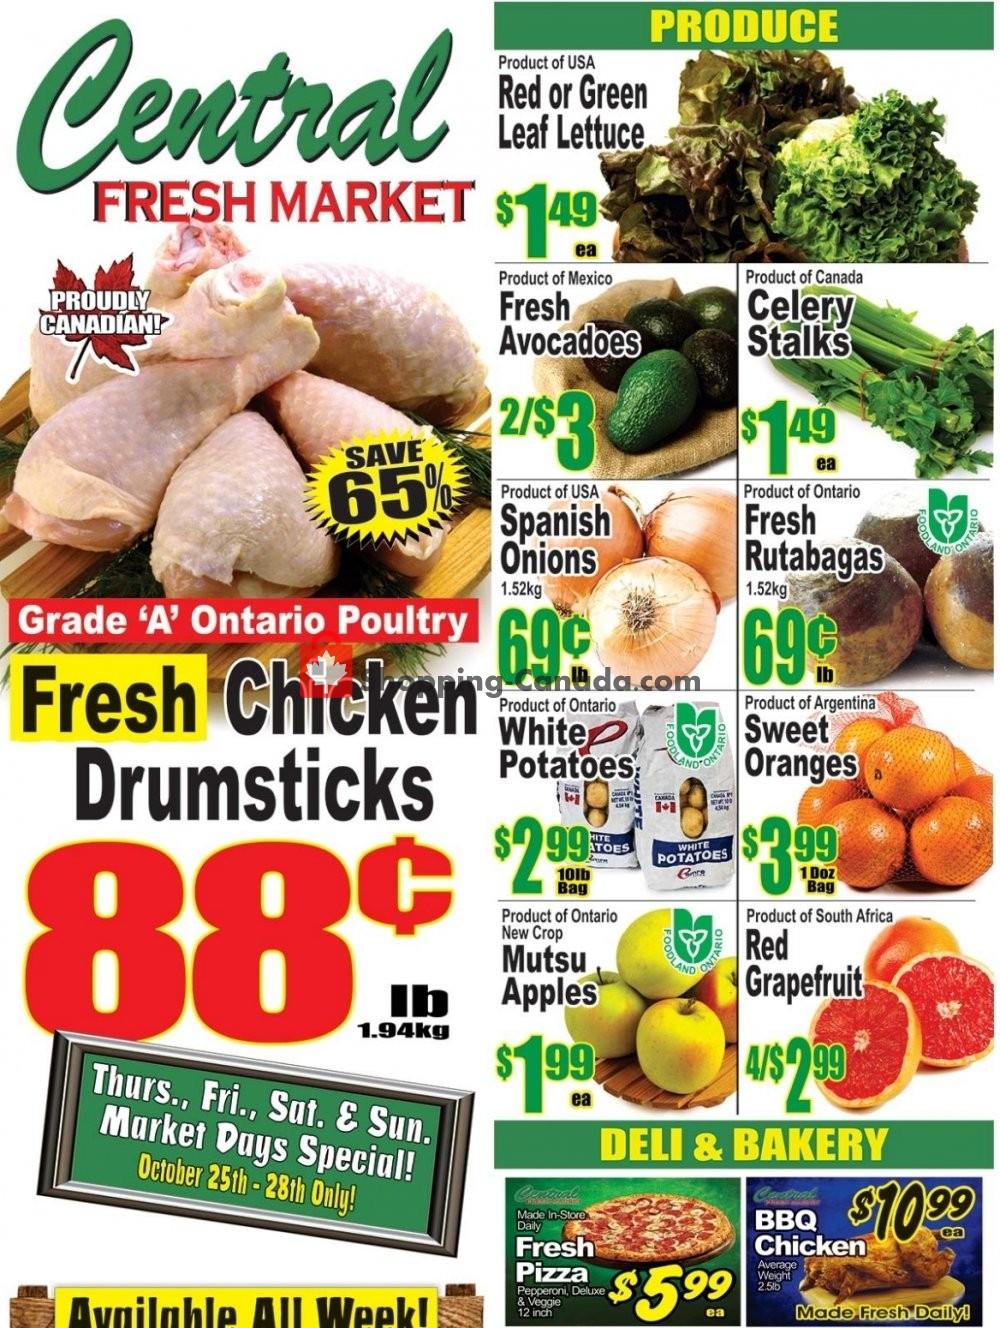 Flyer Central Fresh Market Canada - from Friday October 26, 2018 to Friday November 2, 2018